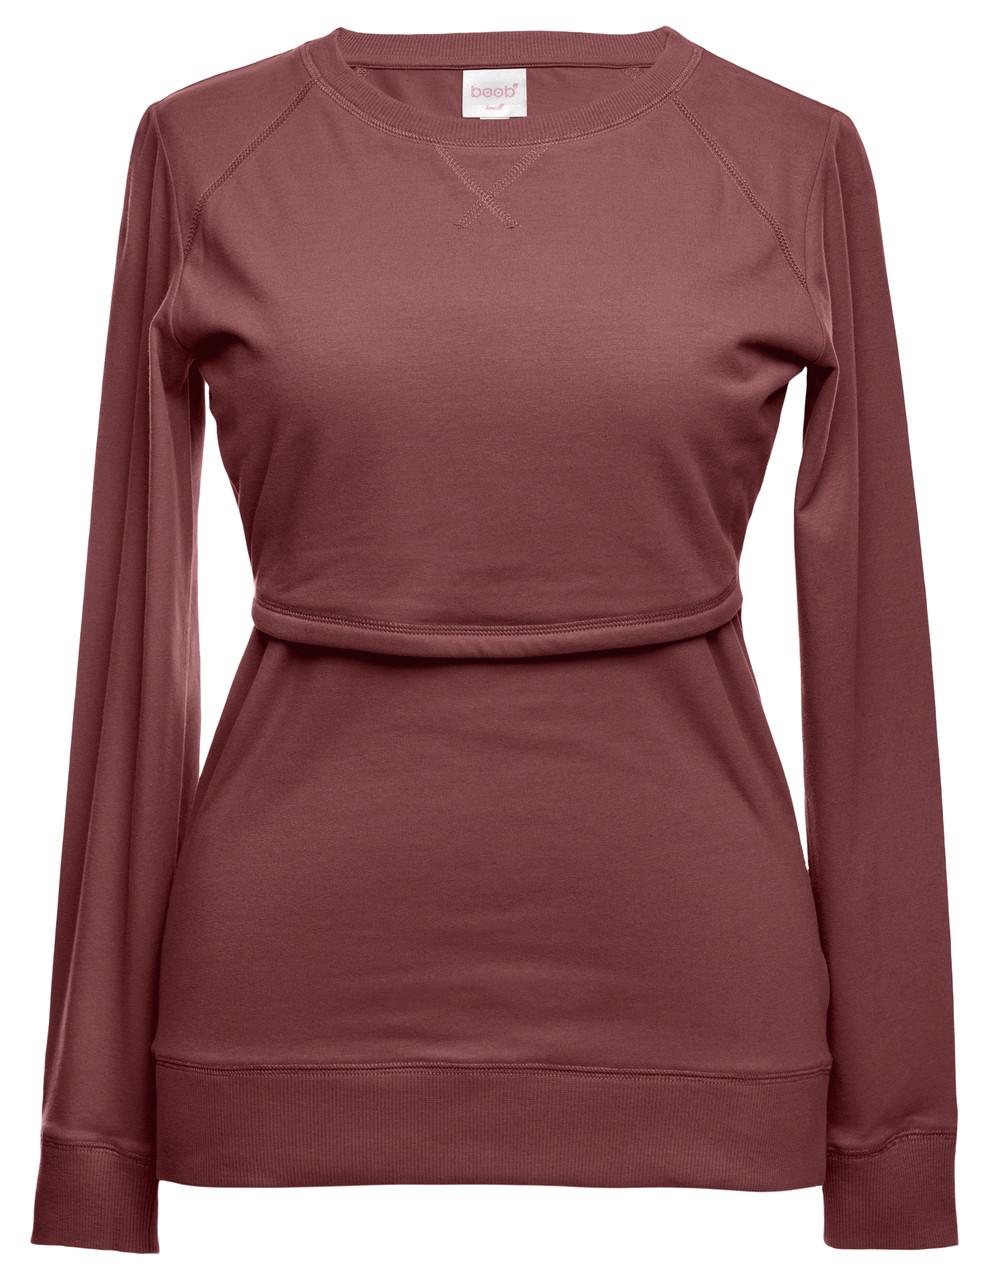 82be3366bfce4 Boob Design B.Warmer Maternity/Nursing Sweater - midnight - Stockholm  Objects